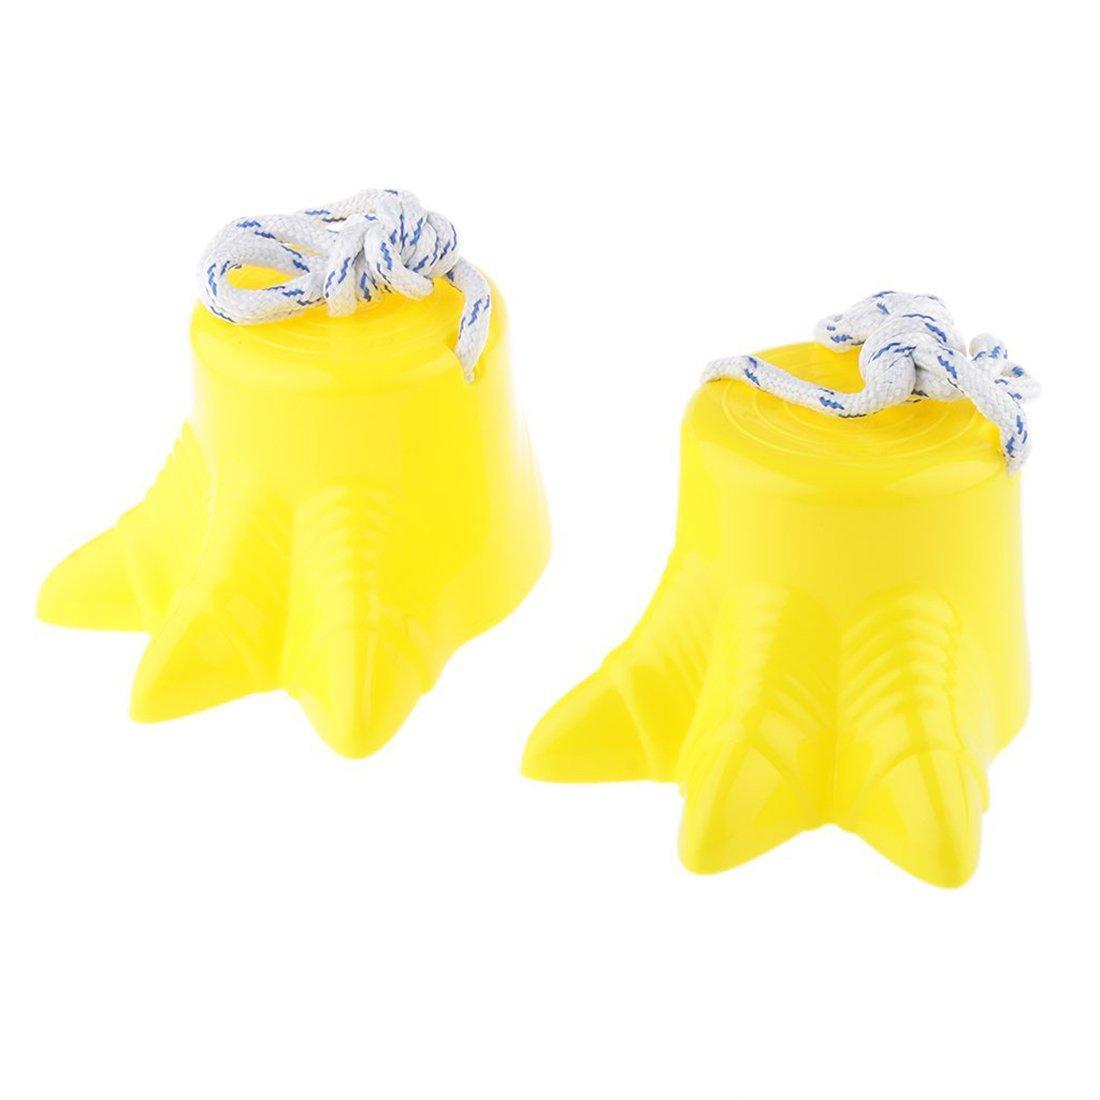 SODIAL Kids Movement Balance Sensory Training Dinosaur Foot Stilt Funny Toy Yellow Pack of 2 152779